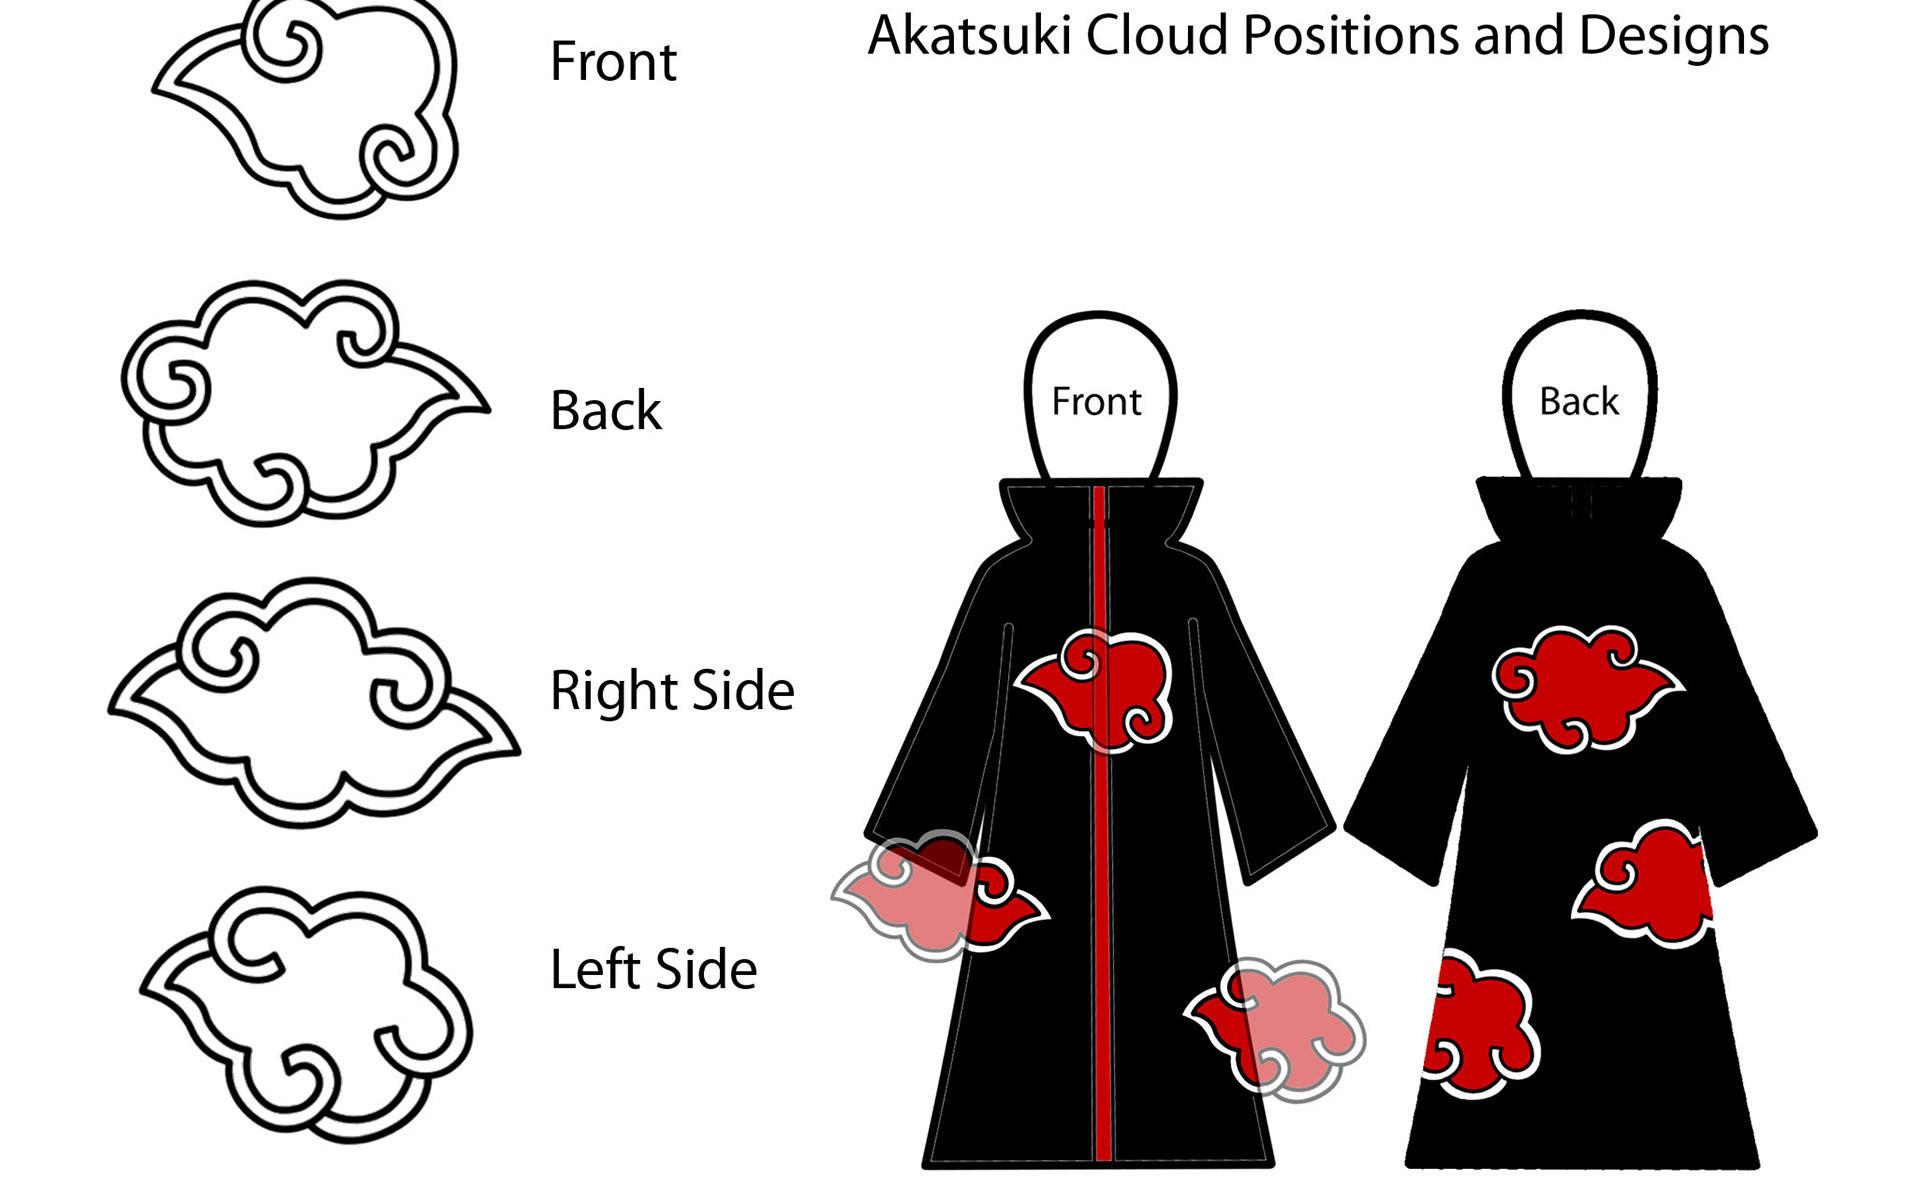 96 Akatsuki Cloud